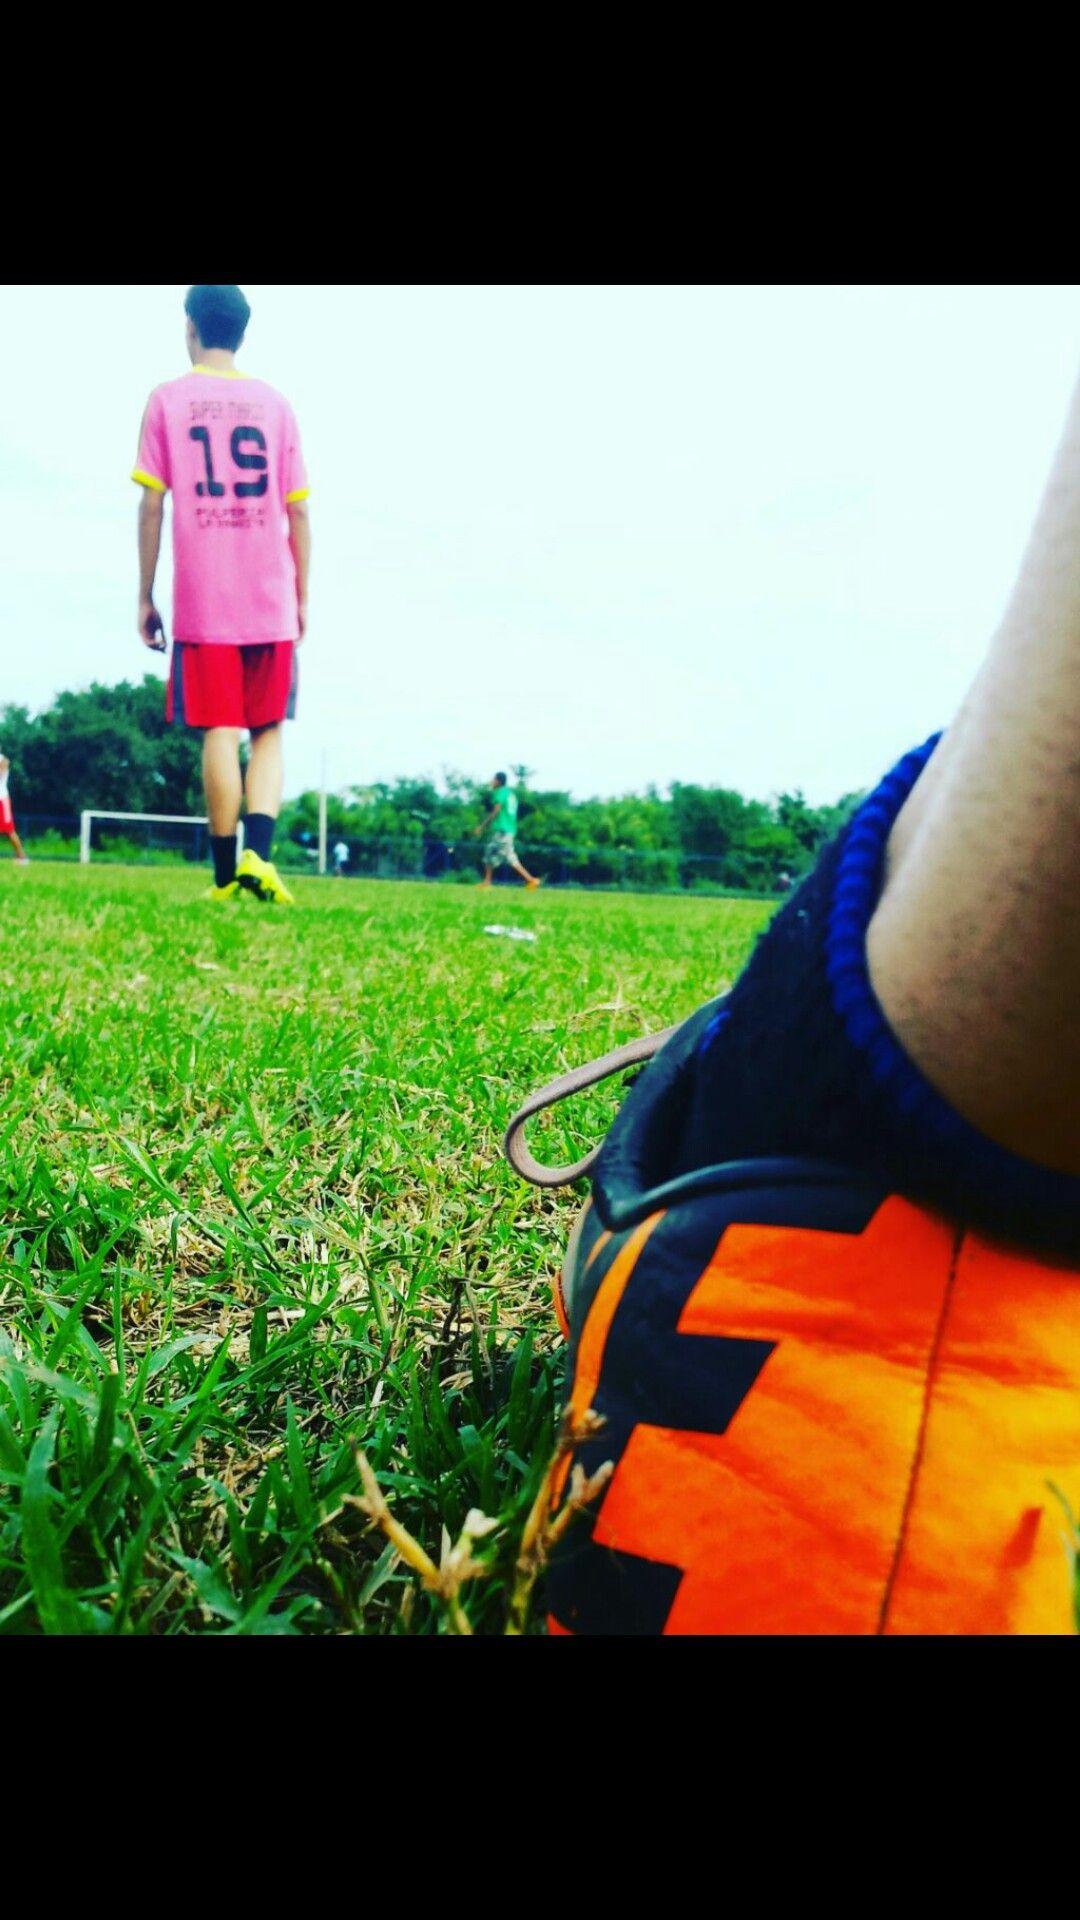 Fútbol amantes al fútbol tumblr fondos fut fútbol tumblr jpg 1080x1920  Botines futbol yy tumblr d237670c7e027